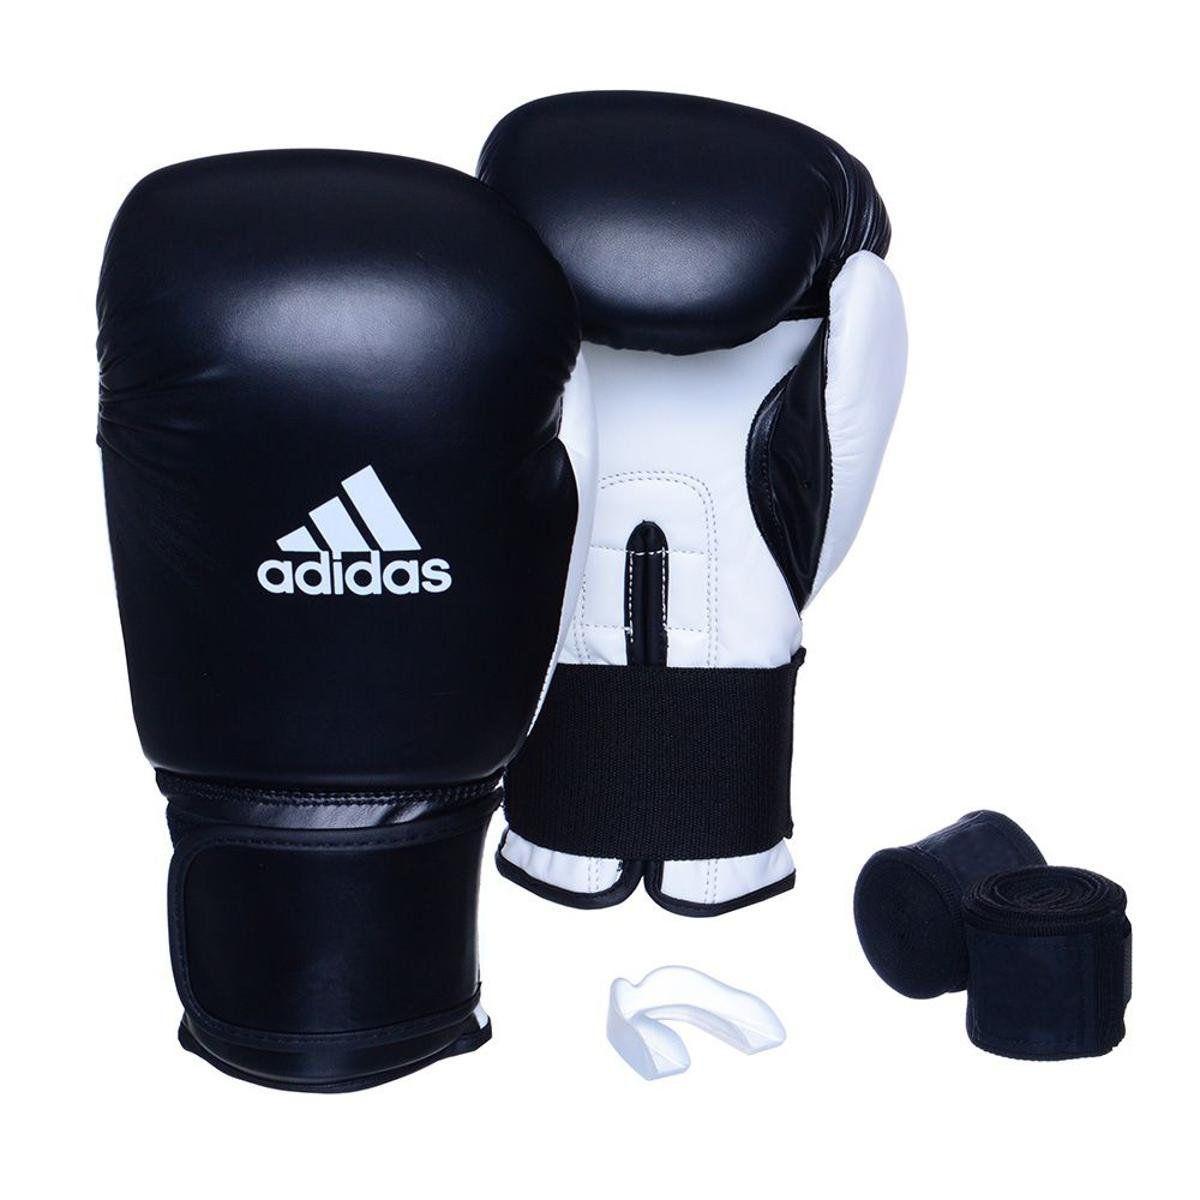 Kit Luvas Boxe / Muay Thai - Adidas Power 100 - Preta / Branca - 10/12/14 OZ